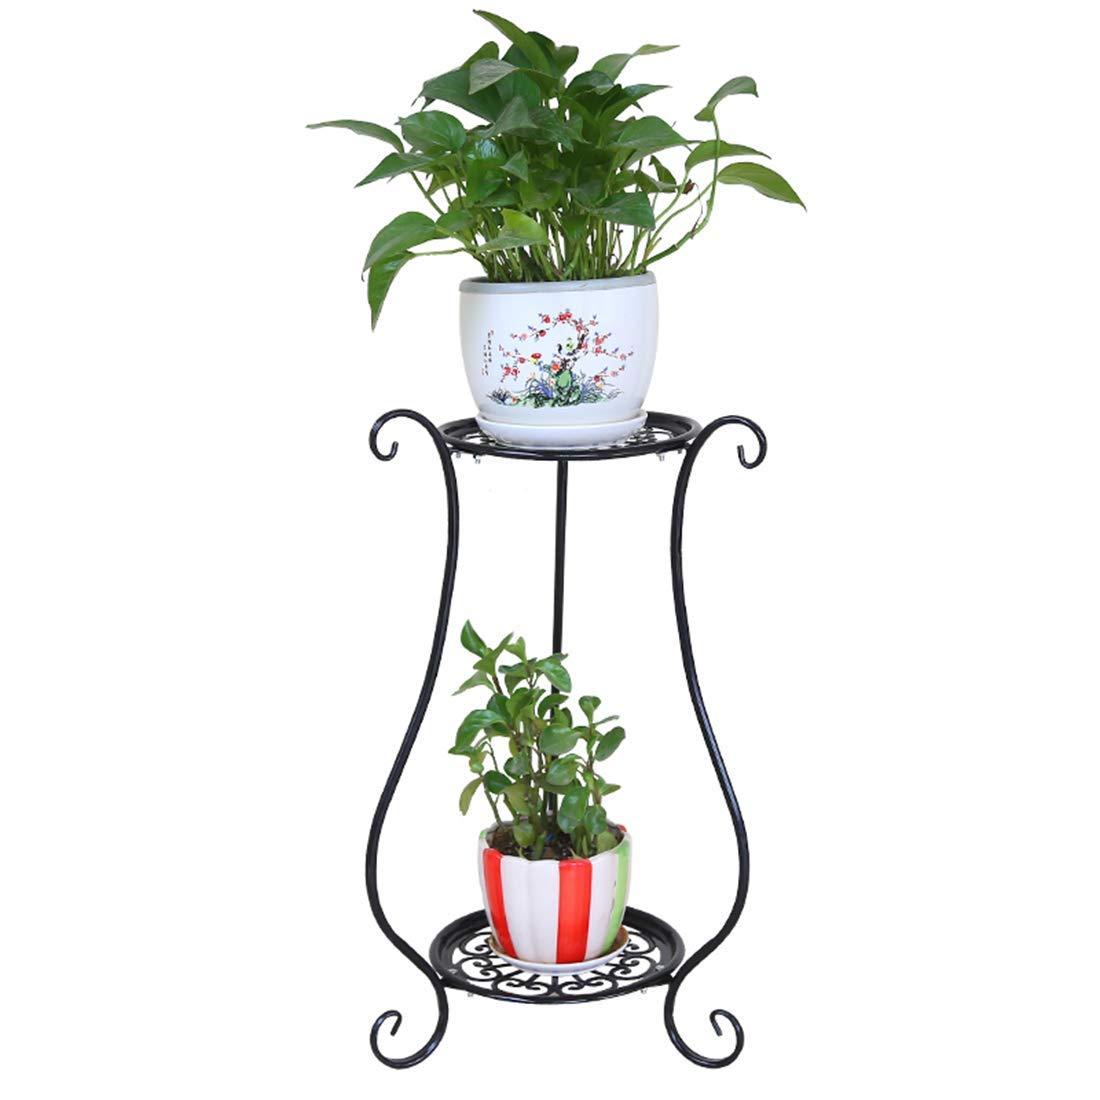 75bf8e8d7e1e Get Quotations · HMANE Plant Pot Stand Multi-Layer Rack Metal Art Rack  Holder Flowerpot Display Shelf for